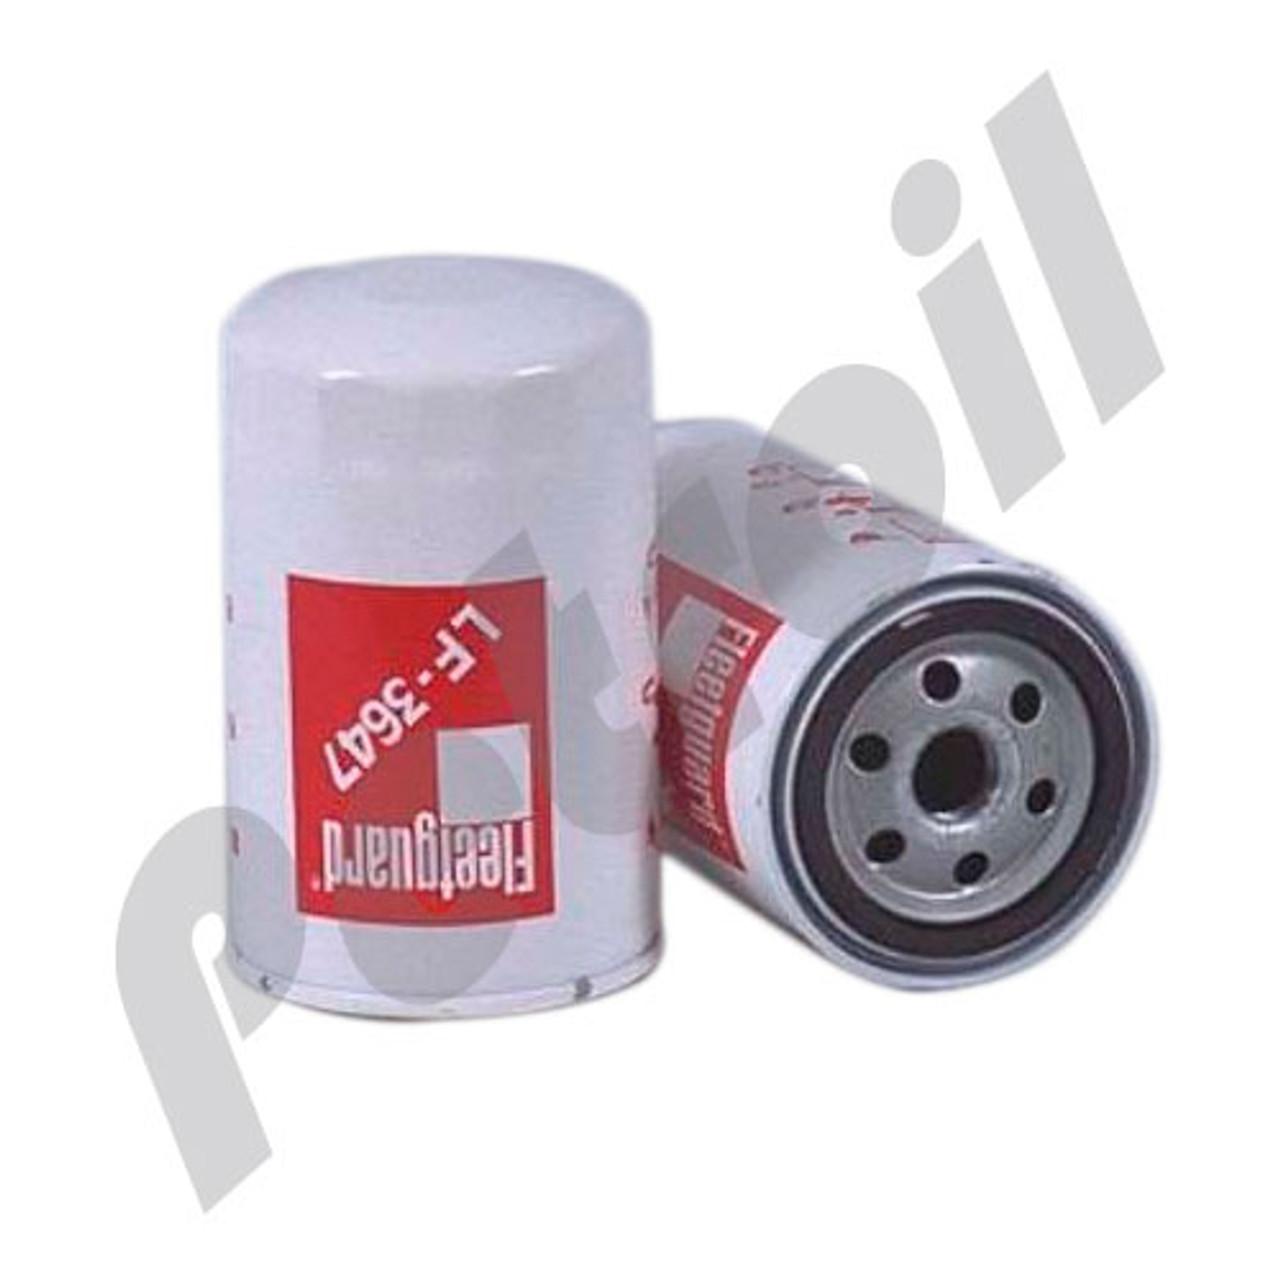 (Case of 12) LF3647 Fleetguard Oil Filter Spin On Caterpillar 1N4402